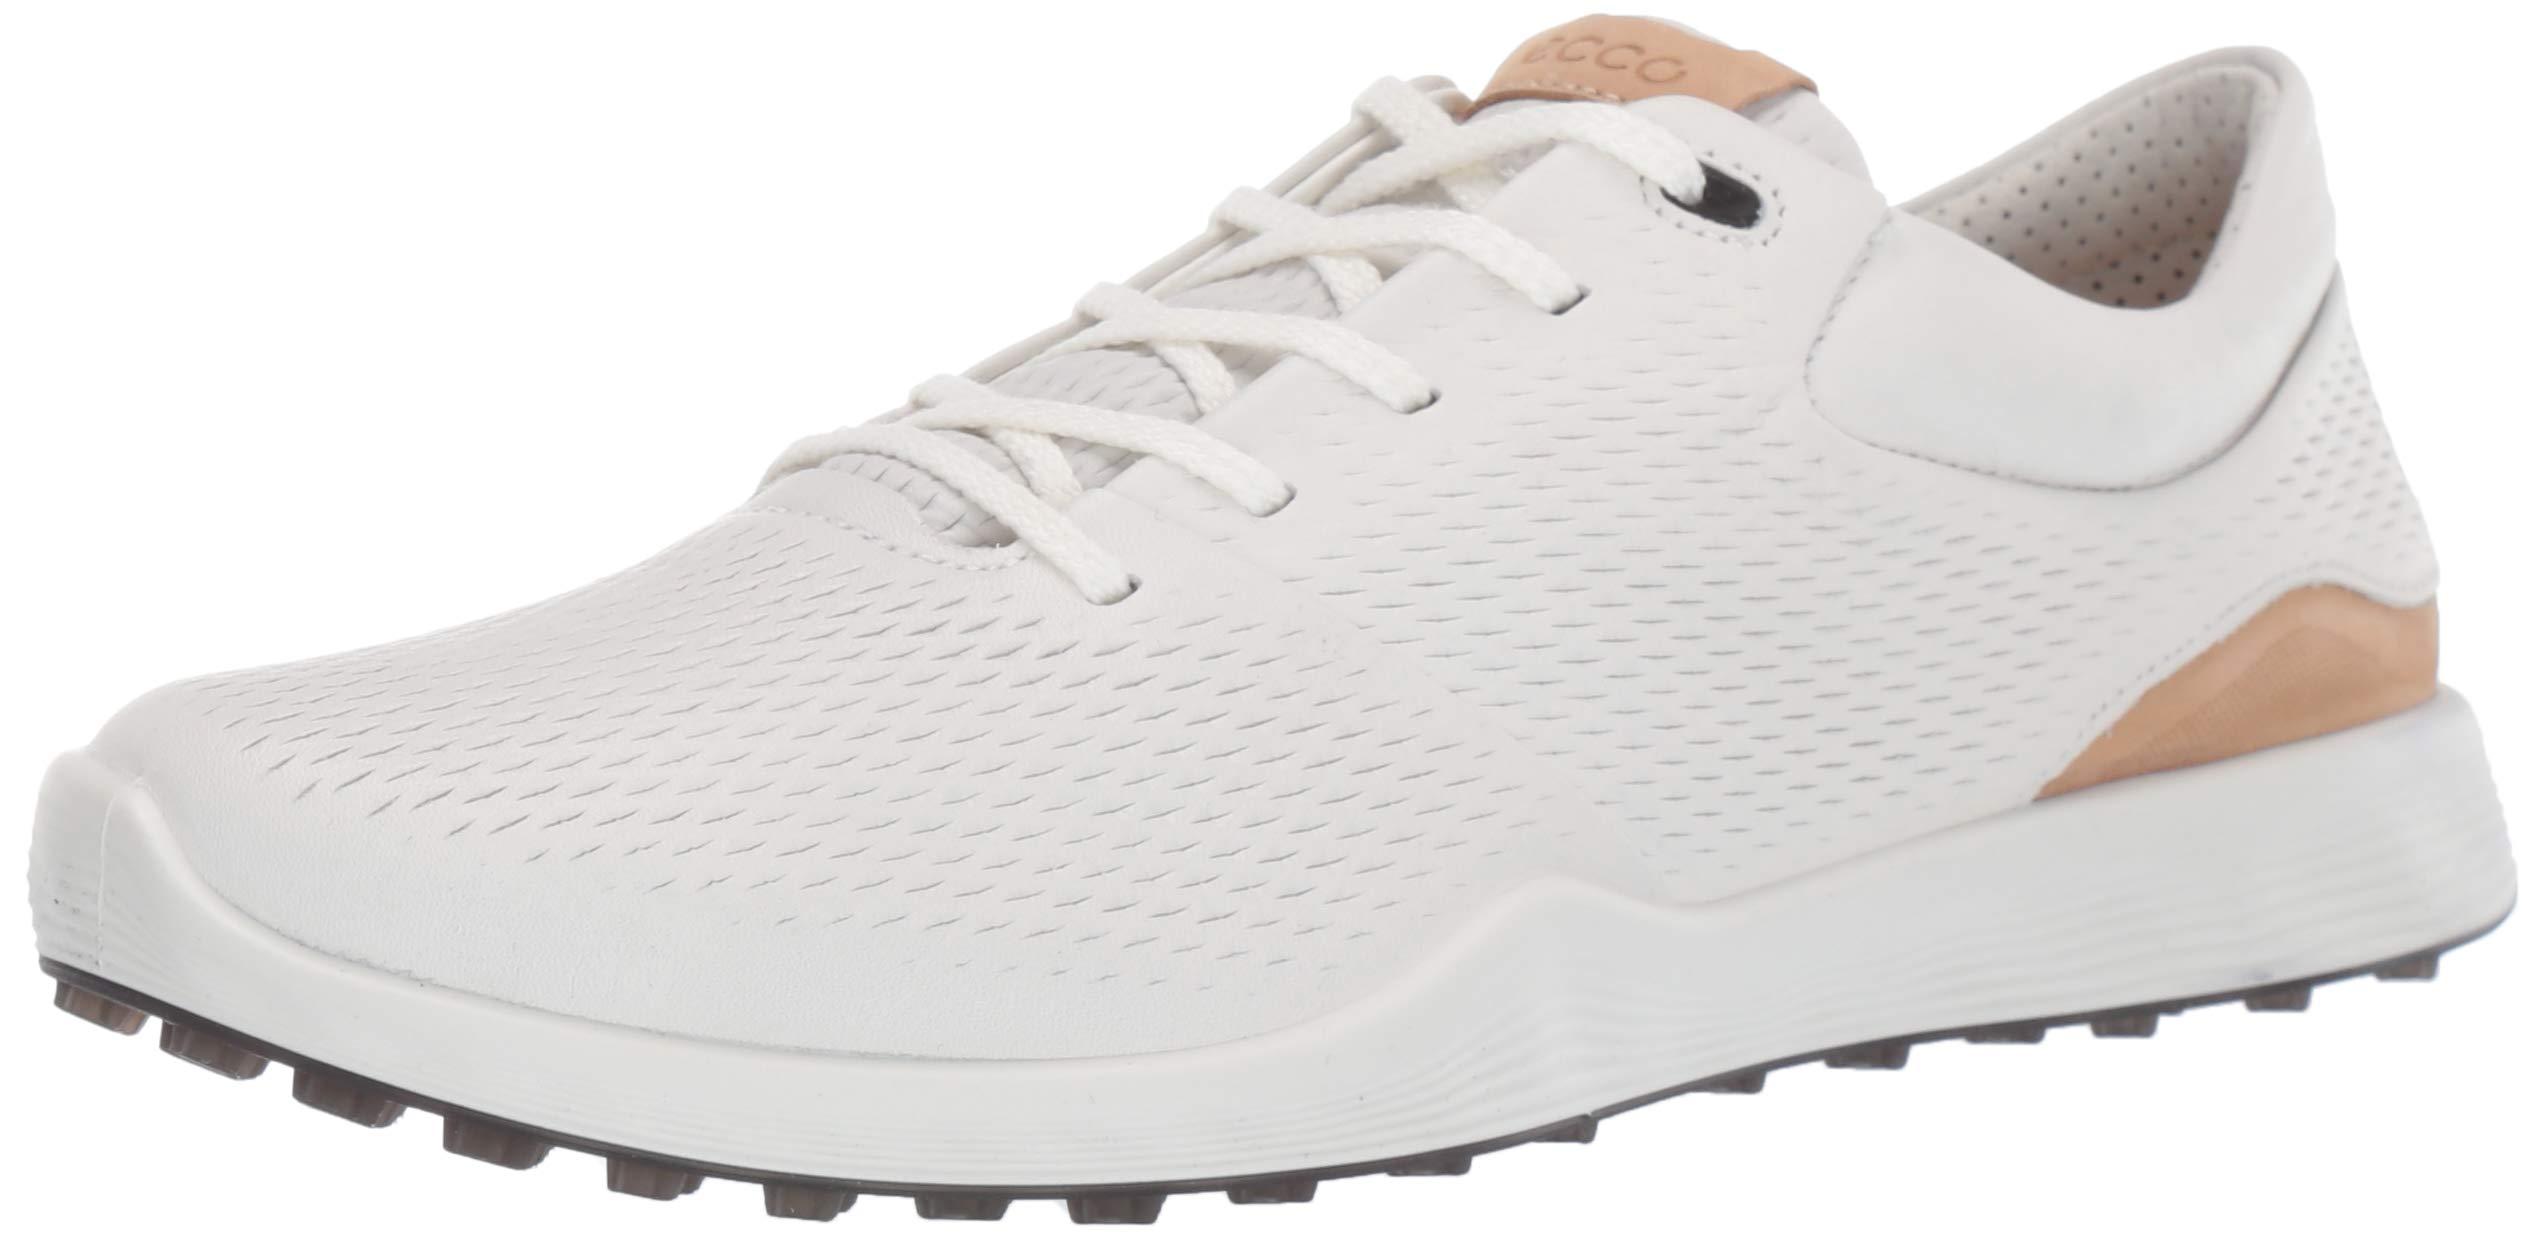 ECCO Women's S-Lite Golf Shoe, White Yak Leather, 6 M US by ECCO